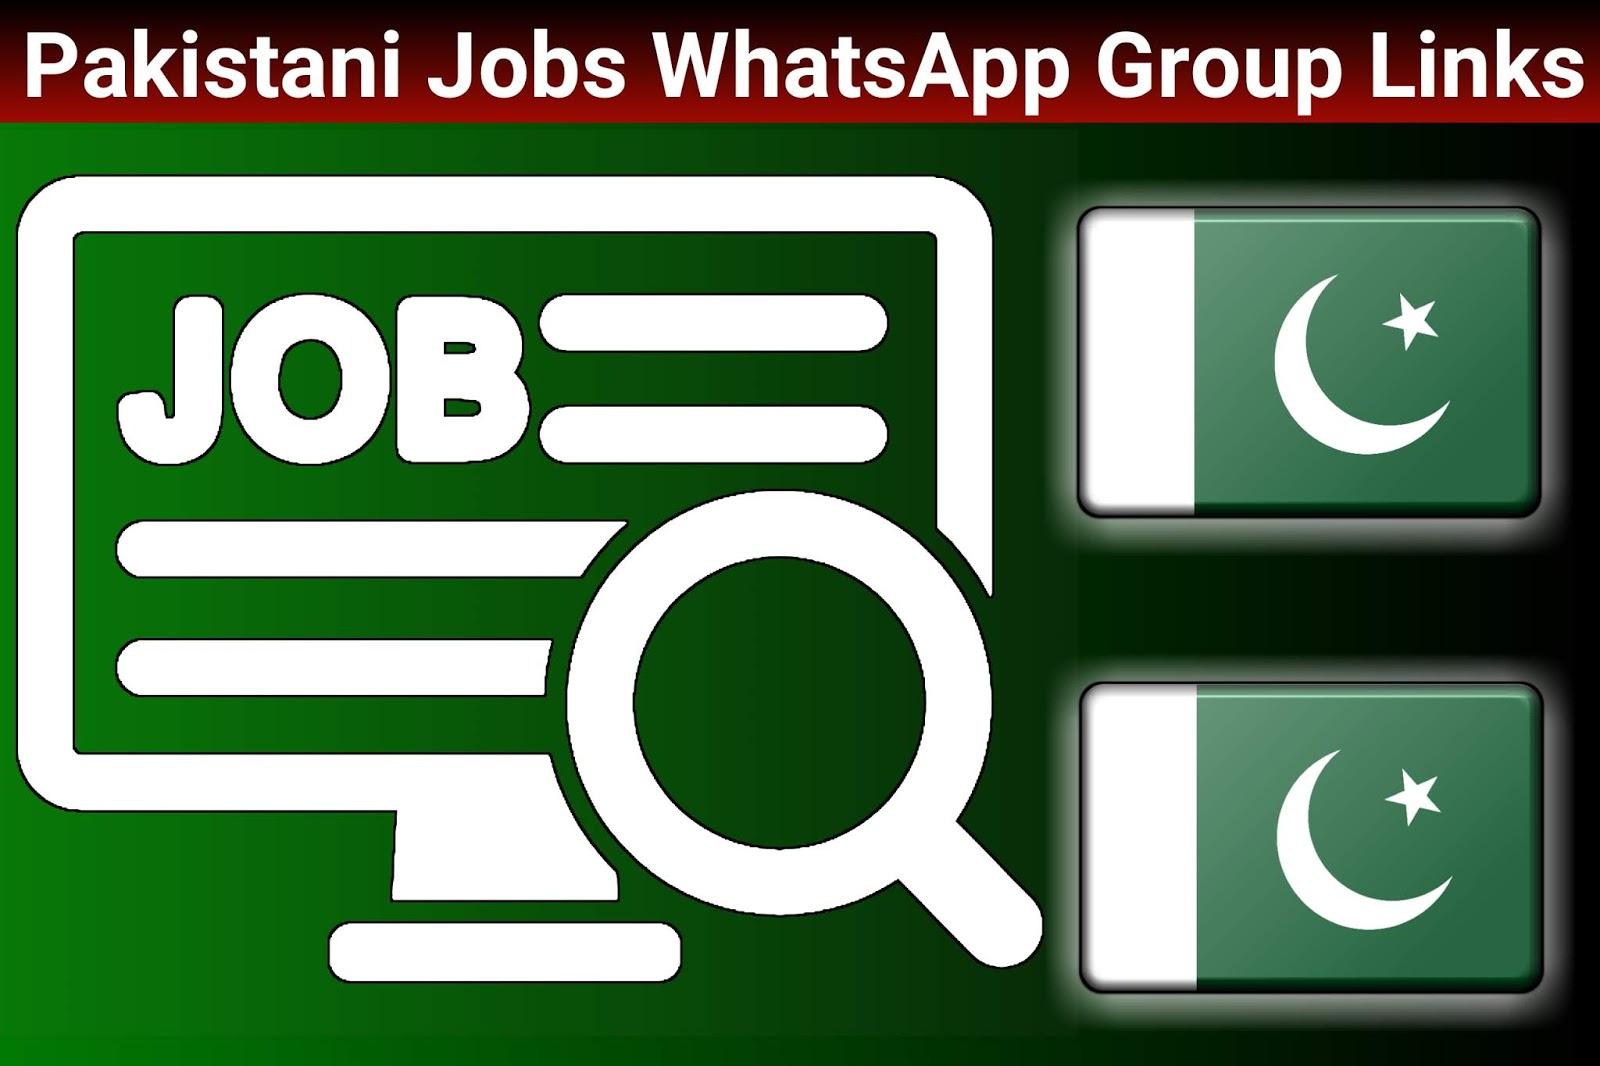 Pakistan Job WhatsApp Group Link - Join Pakistan WhatsApp Group